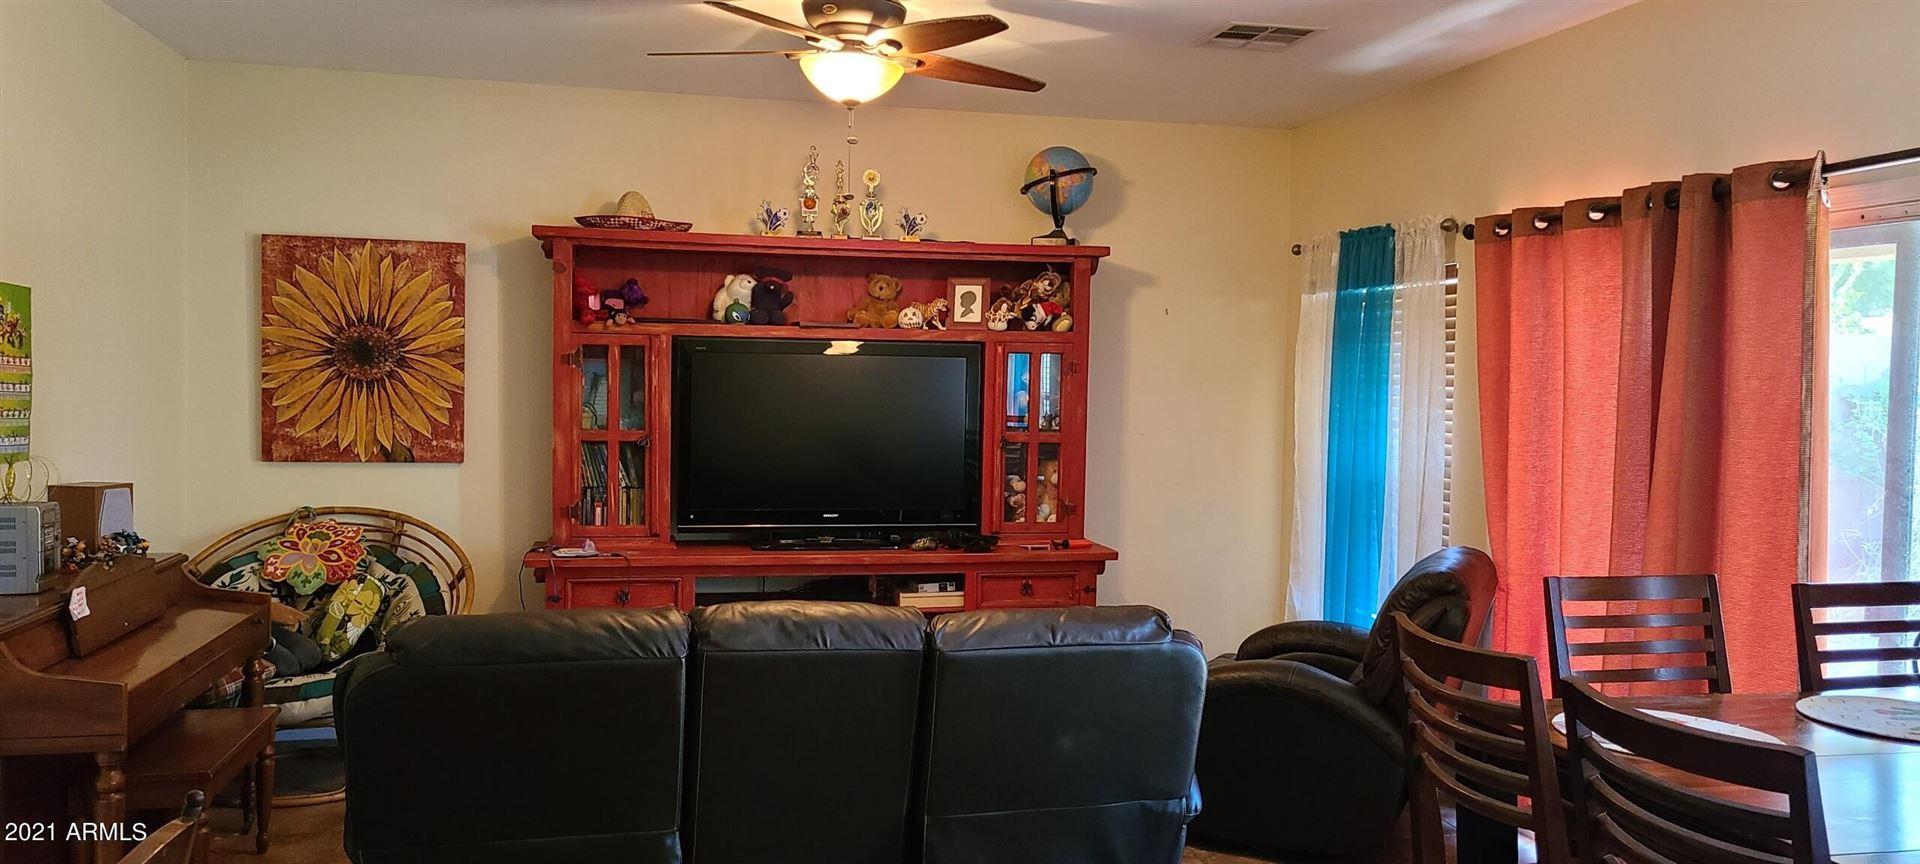 Photo of 15844 W VENTURA Street, Surprise, AZ 85379 (MLS # 6271087)